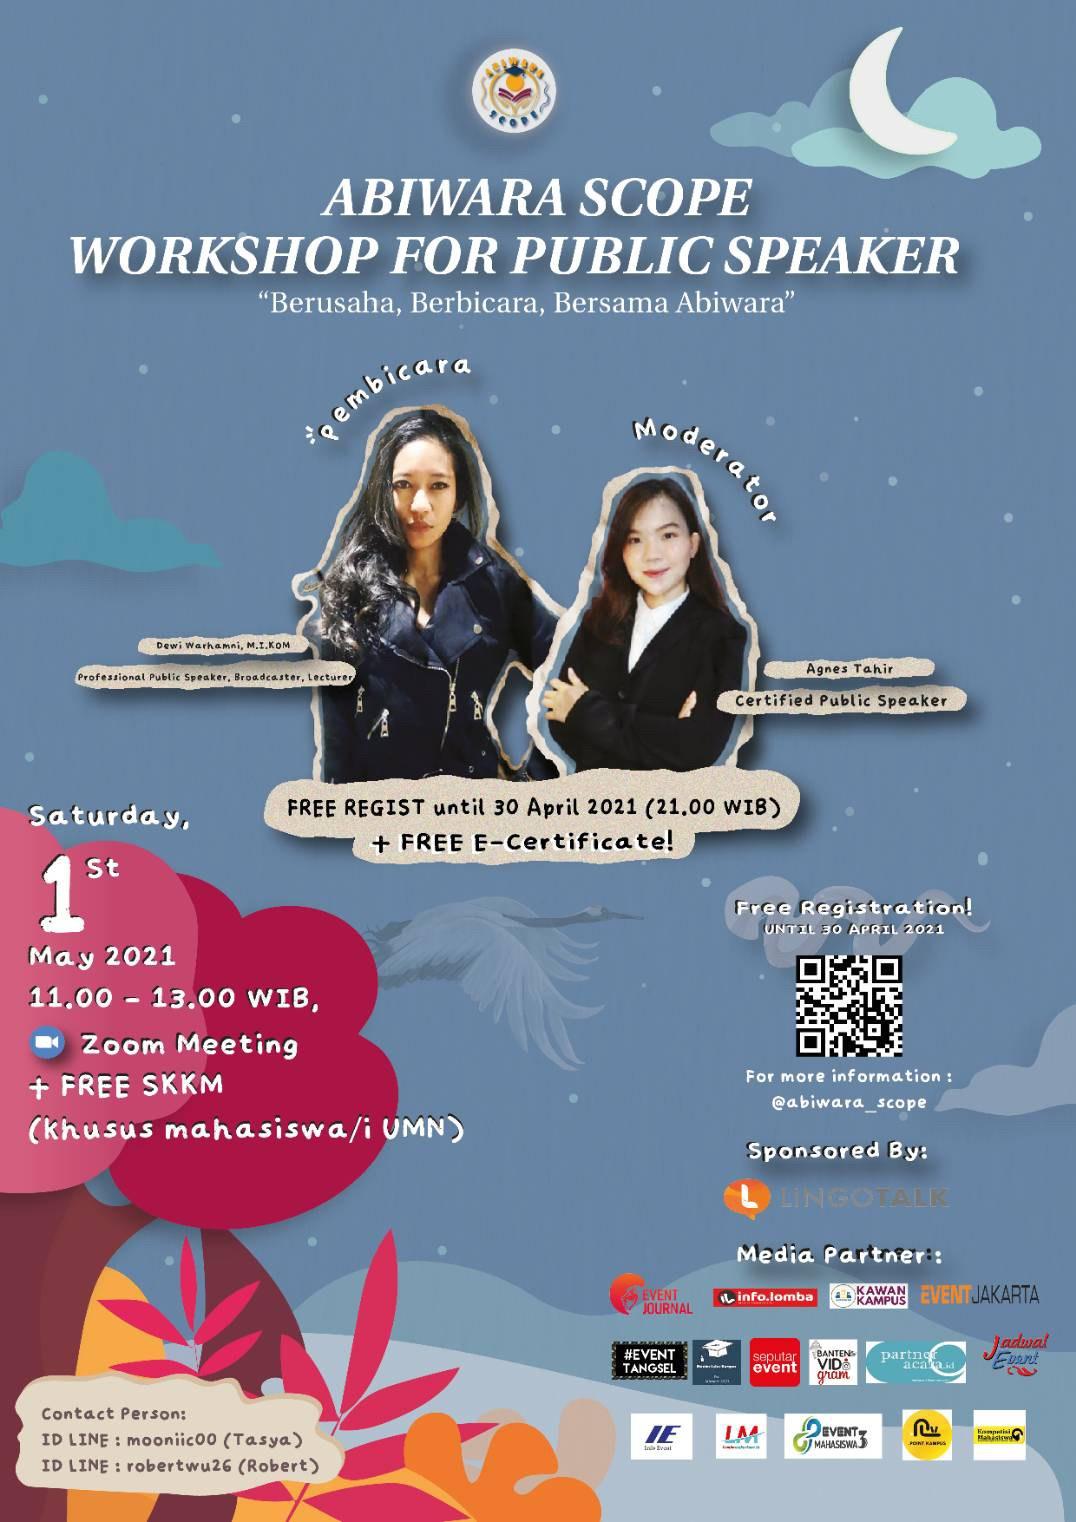 Abiwara Scope - Workshop For Public Speaker